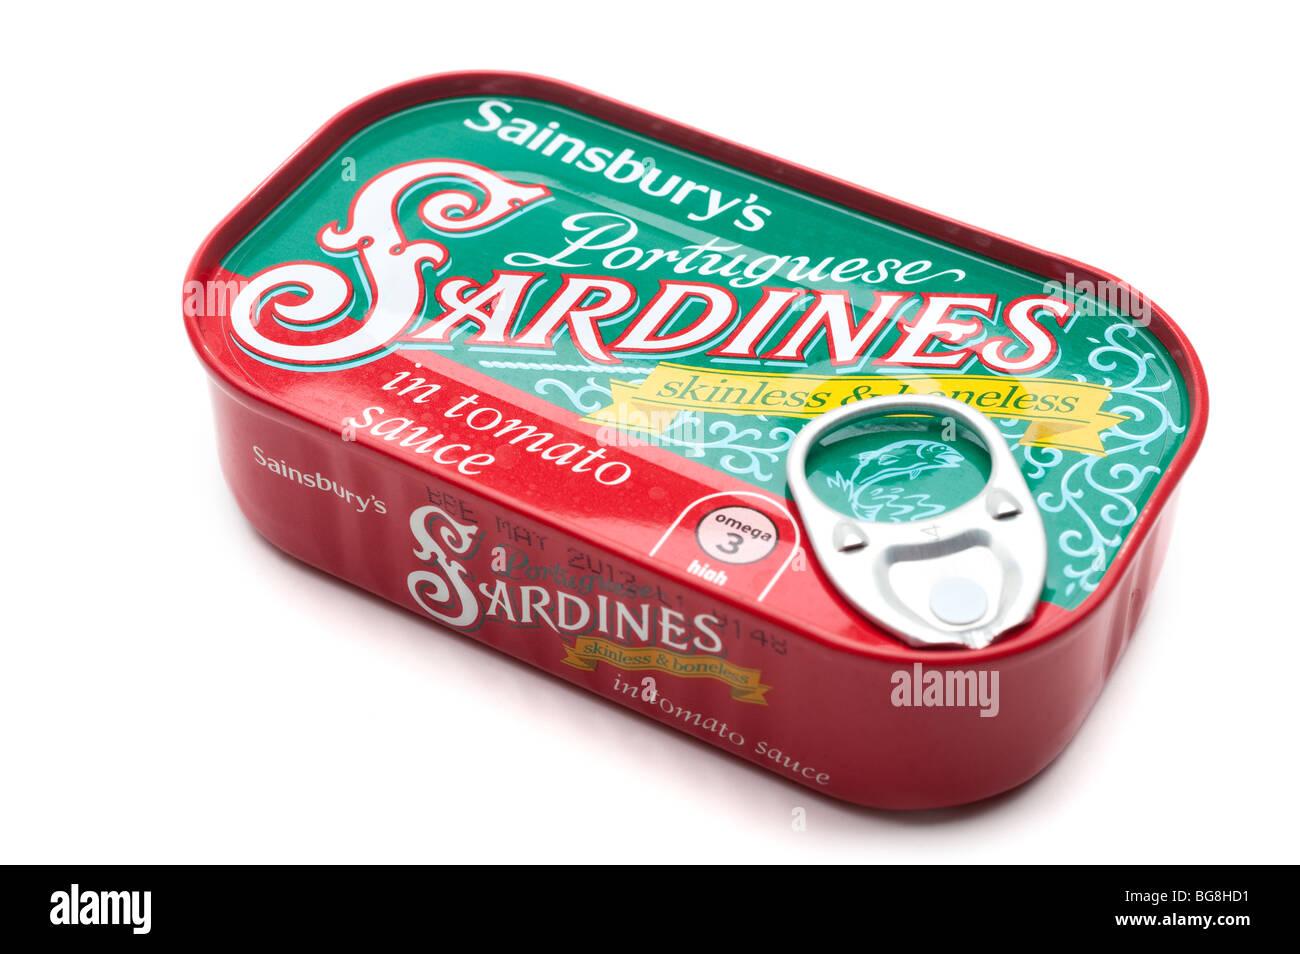 Boîte de sardines portugaises Sainsbury's Photo Stock